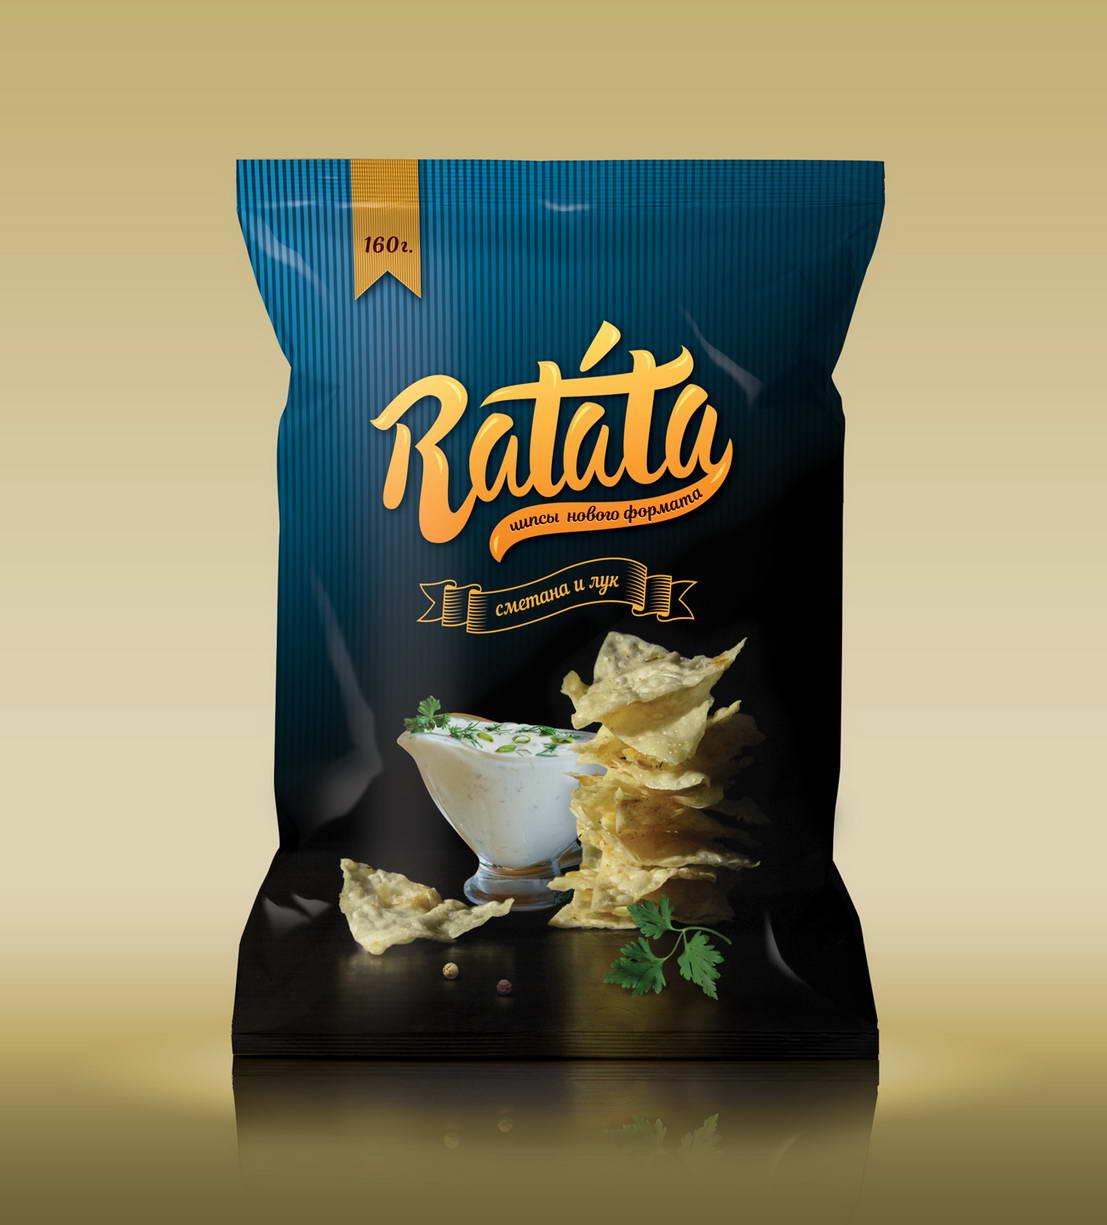 Дизайн упаковки чипсов Ratata сметана и лук